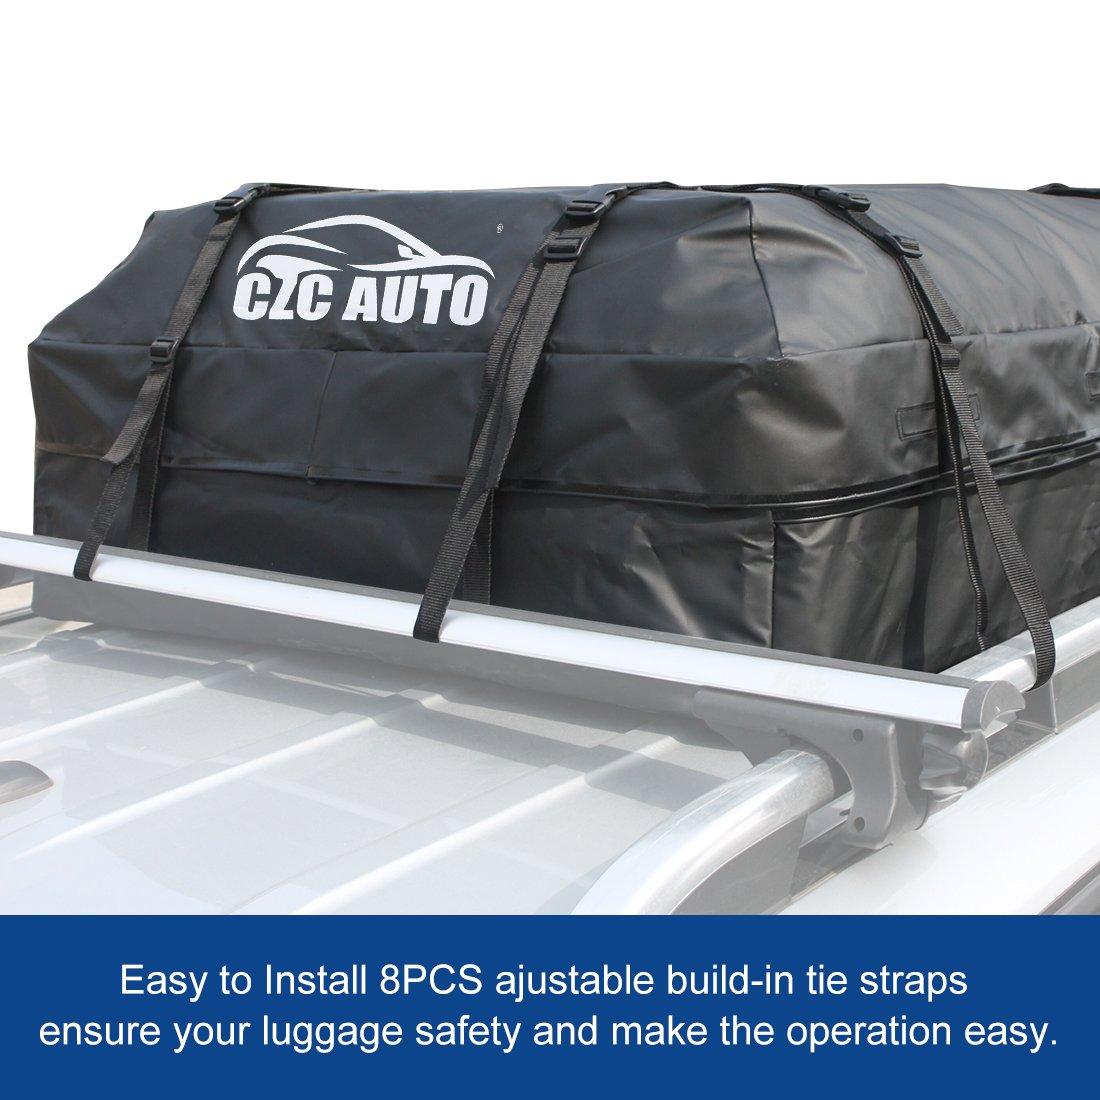 CZC AUTO Car Roof Cargo Carrier, 15 cu. ft Waterproof/Rainproof/Weatherproof Rooftop Storage Bag for Car SUV Van Sedan with Roof Rail Cross Bar Basket or Rack, Soft, Black by CZC AUTO (Image #2)